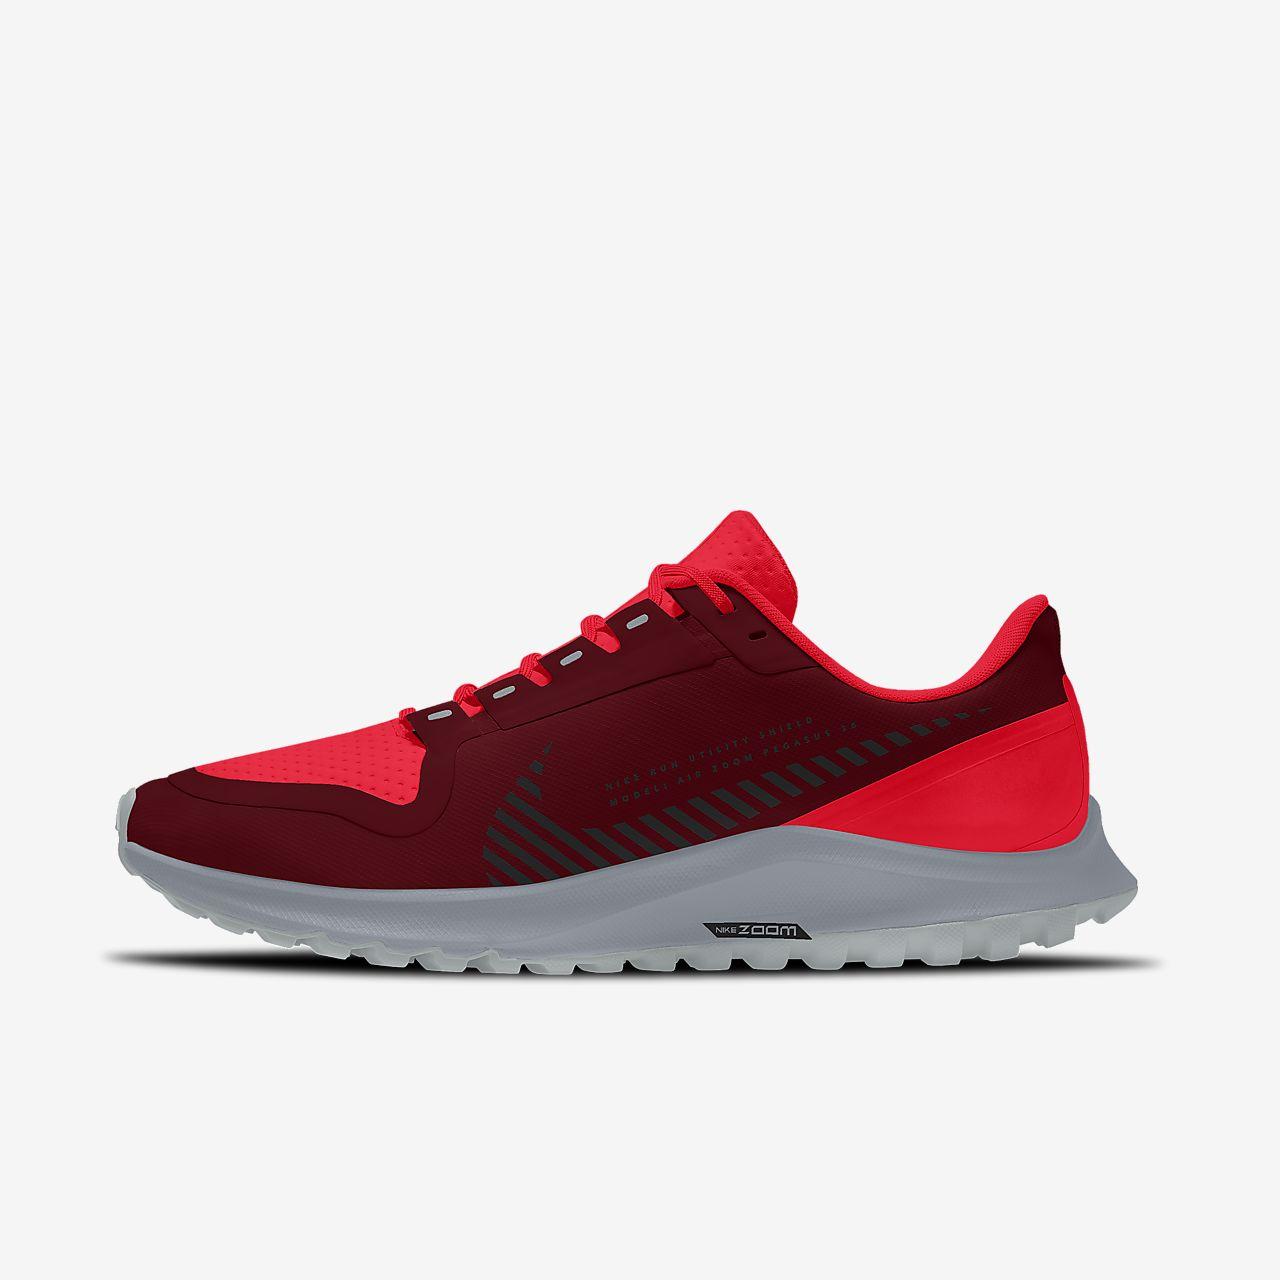 Scarpa da running personalizzabile Nike Air Zoom Pegasus 36 Shield By You Uomo